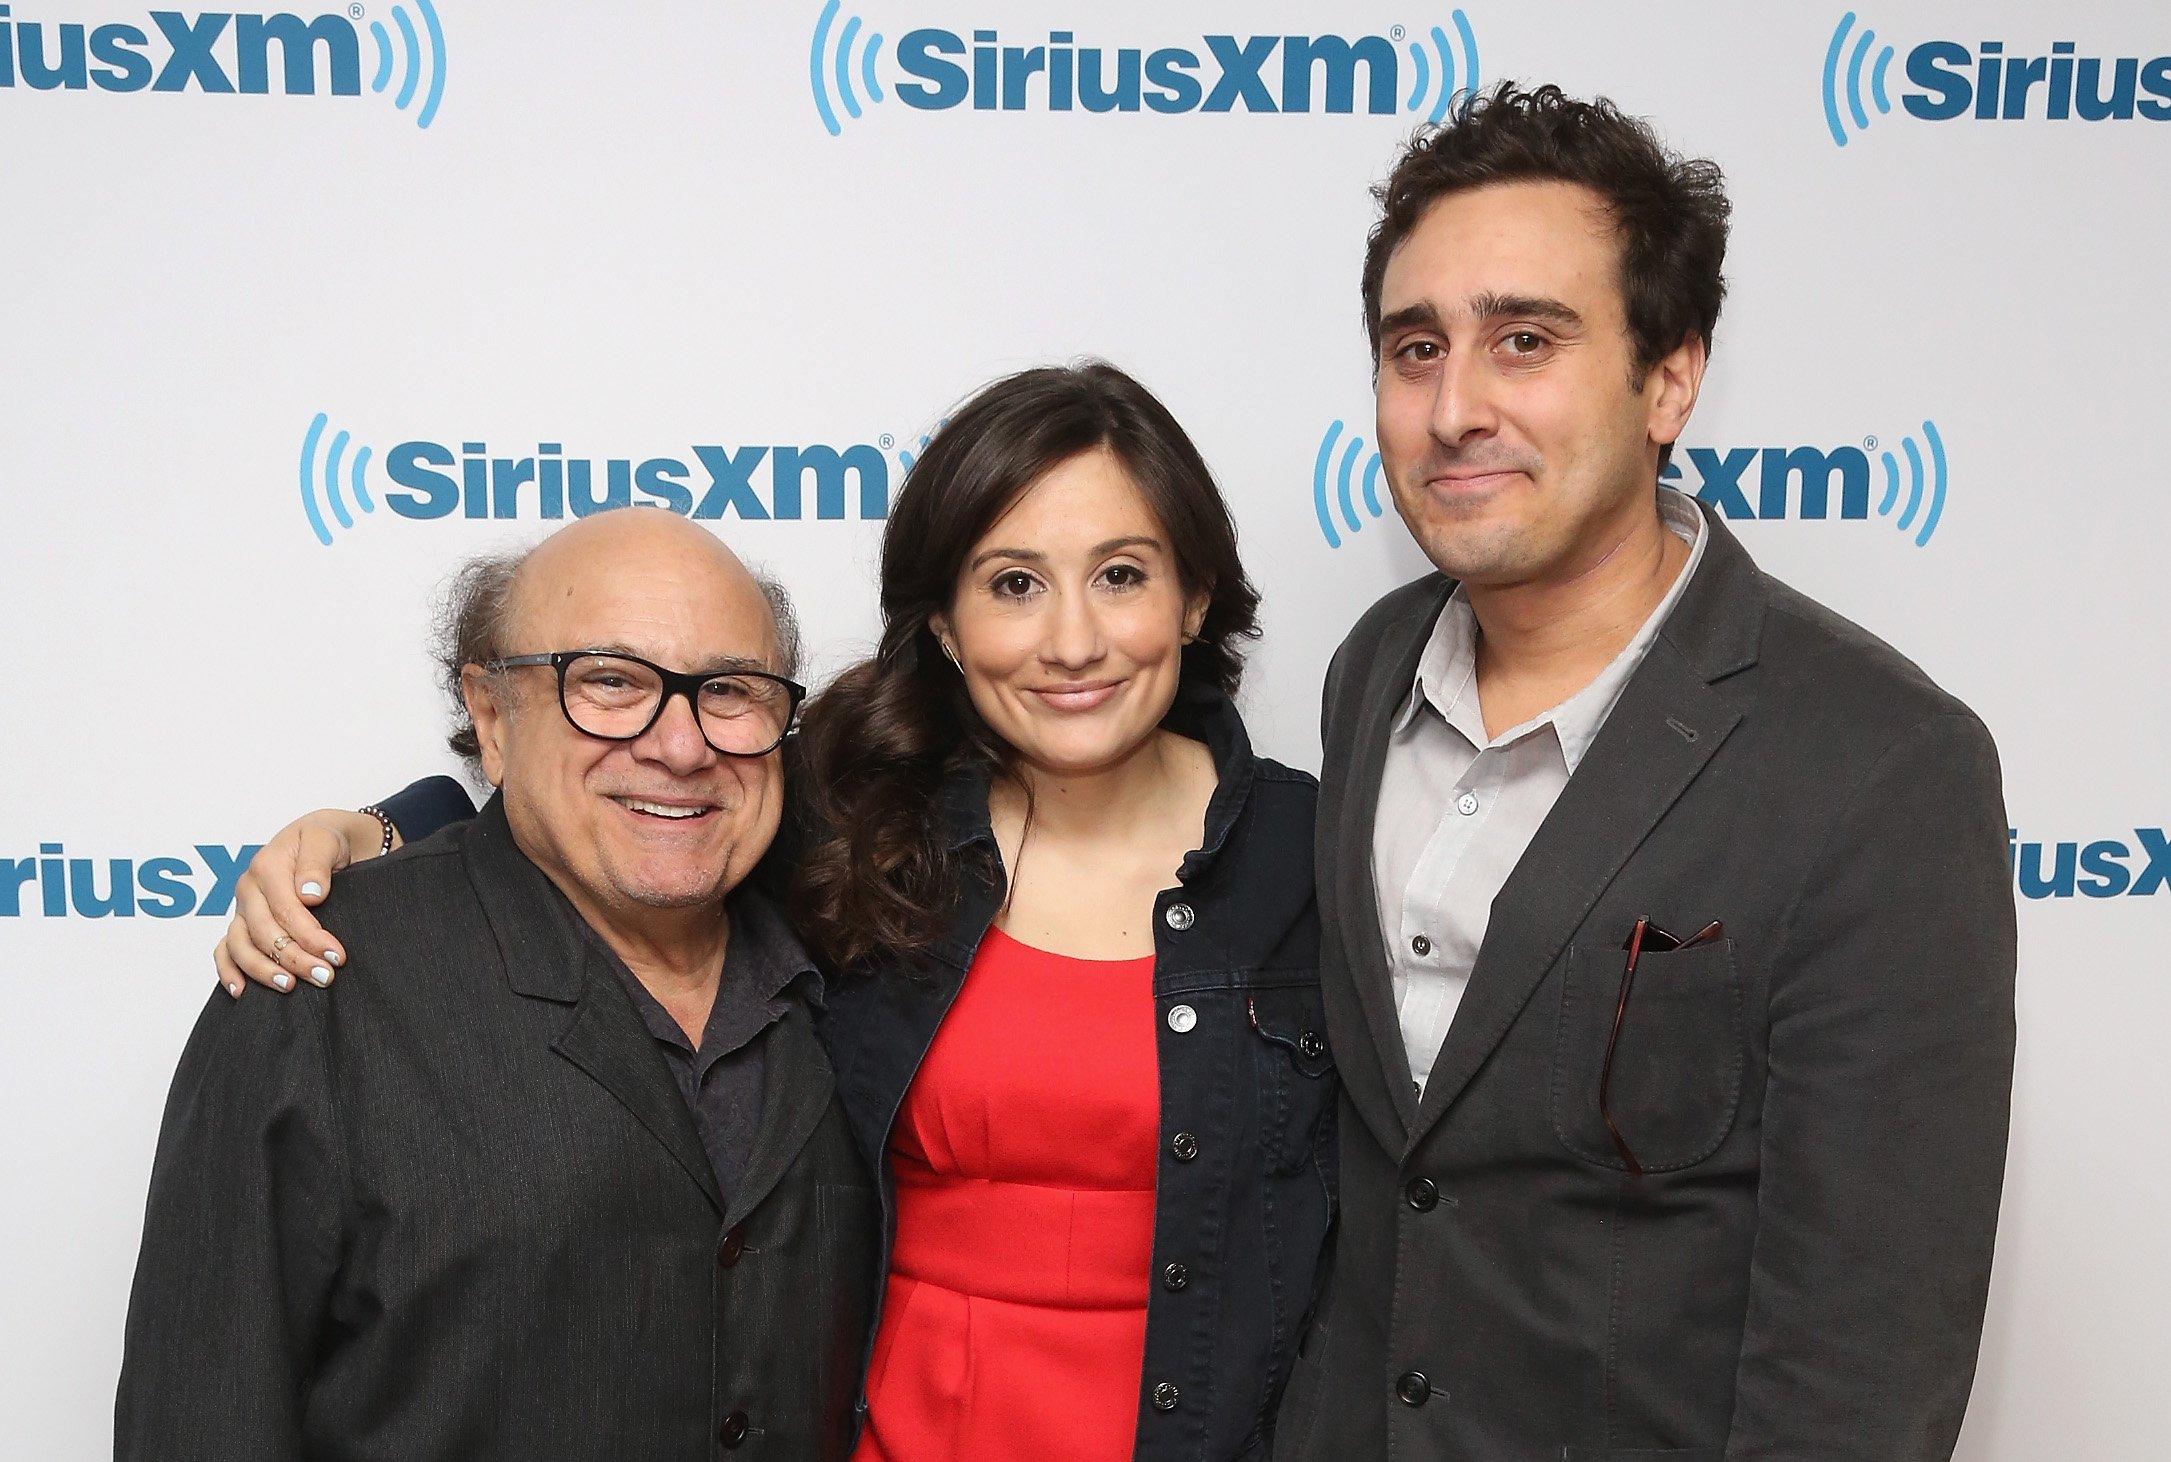 Danny DeVito, Lucy DeVito and Jake DeVito visit at SiriusXM Studio on April 18, 2016. | Source: Getty Images